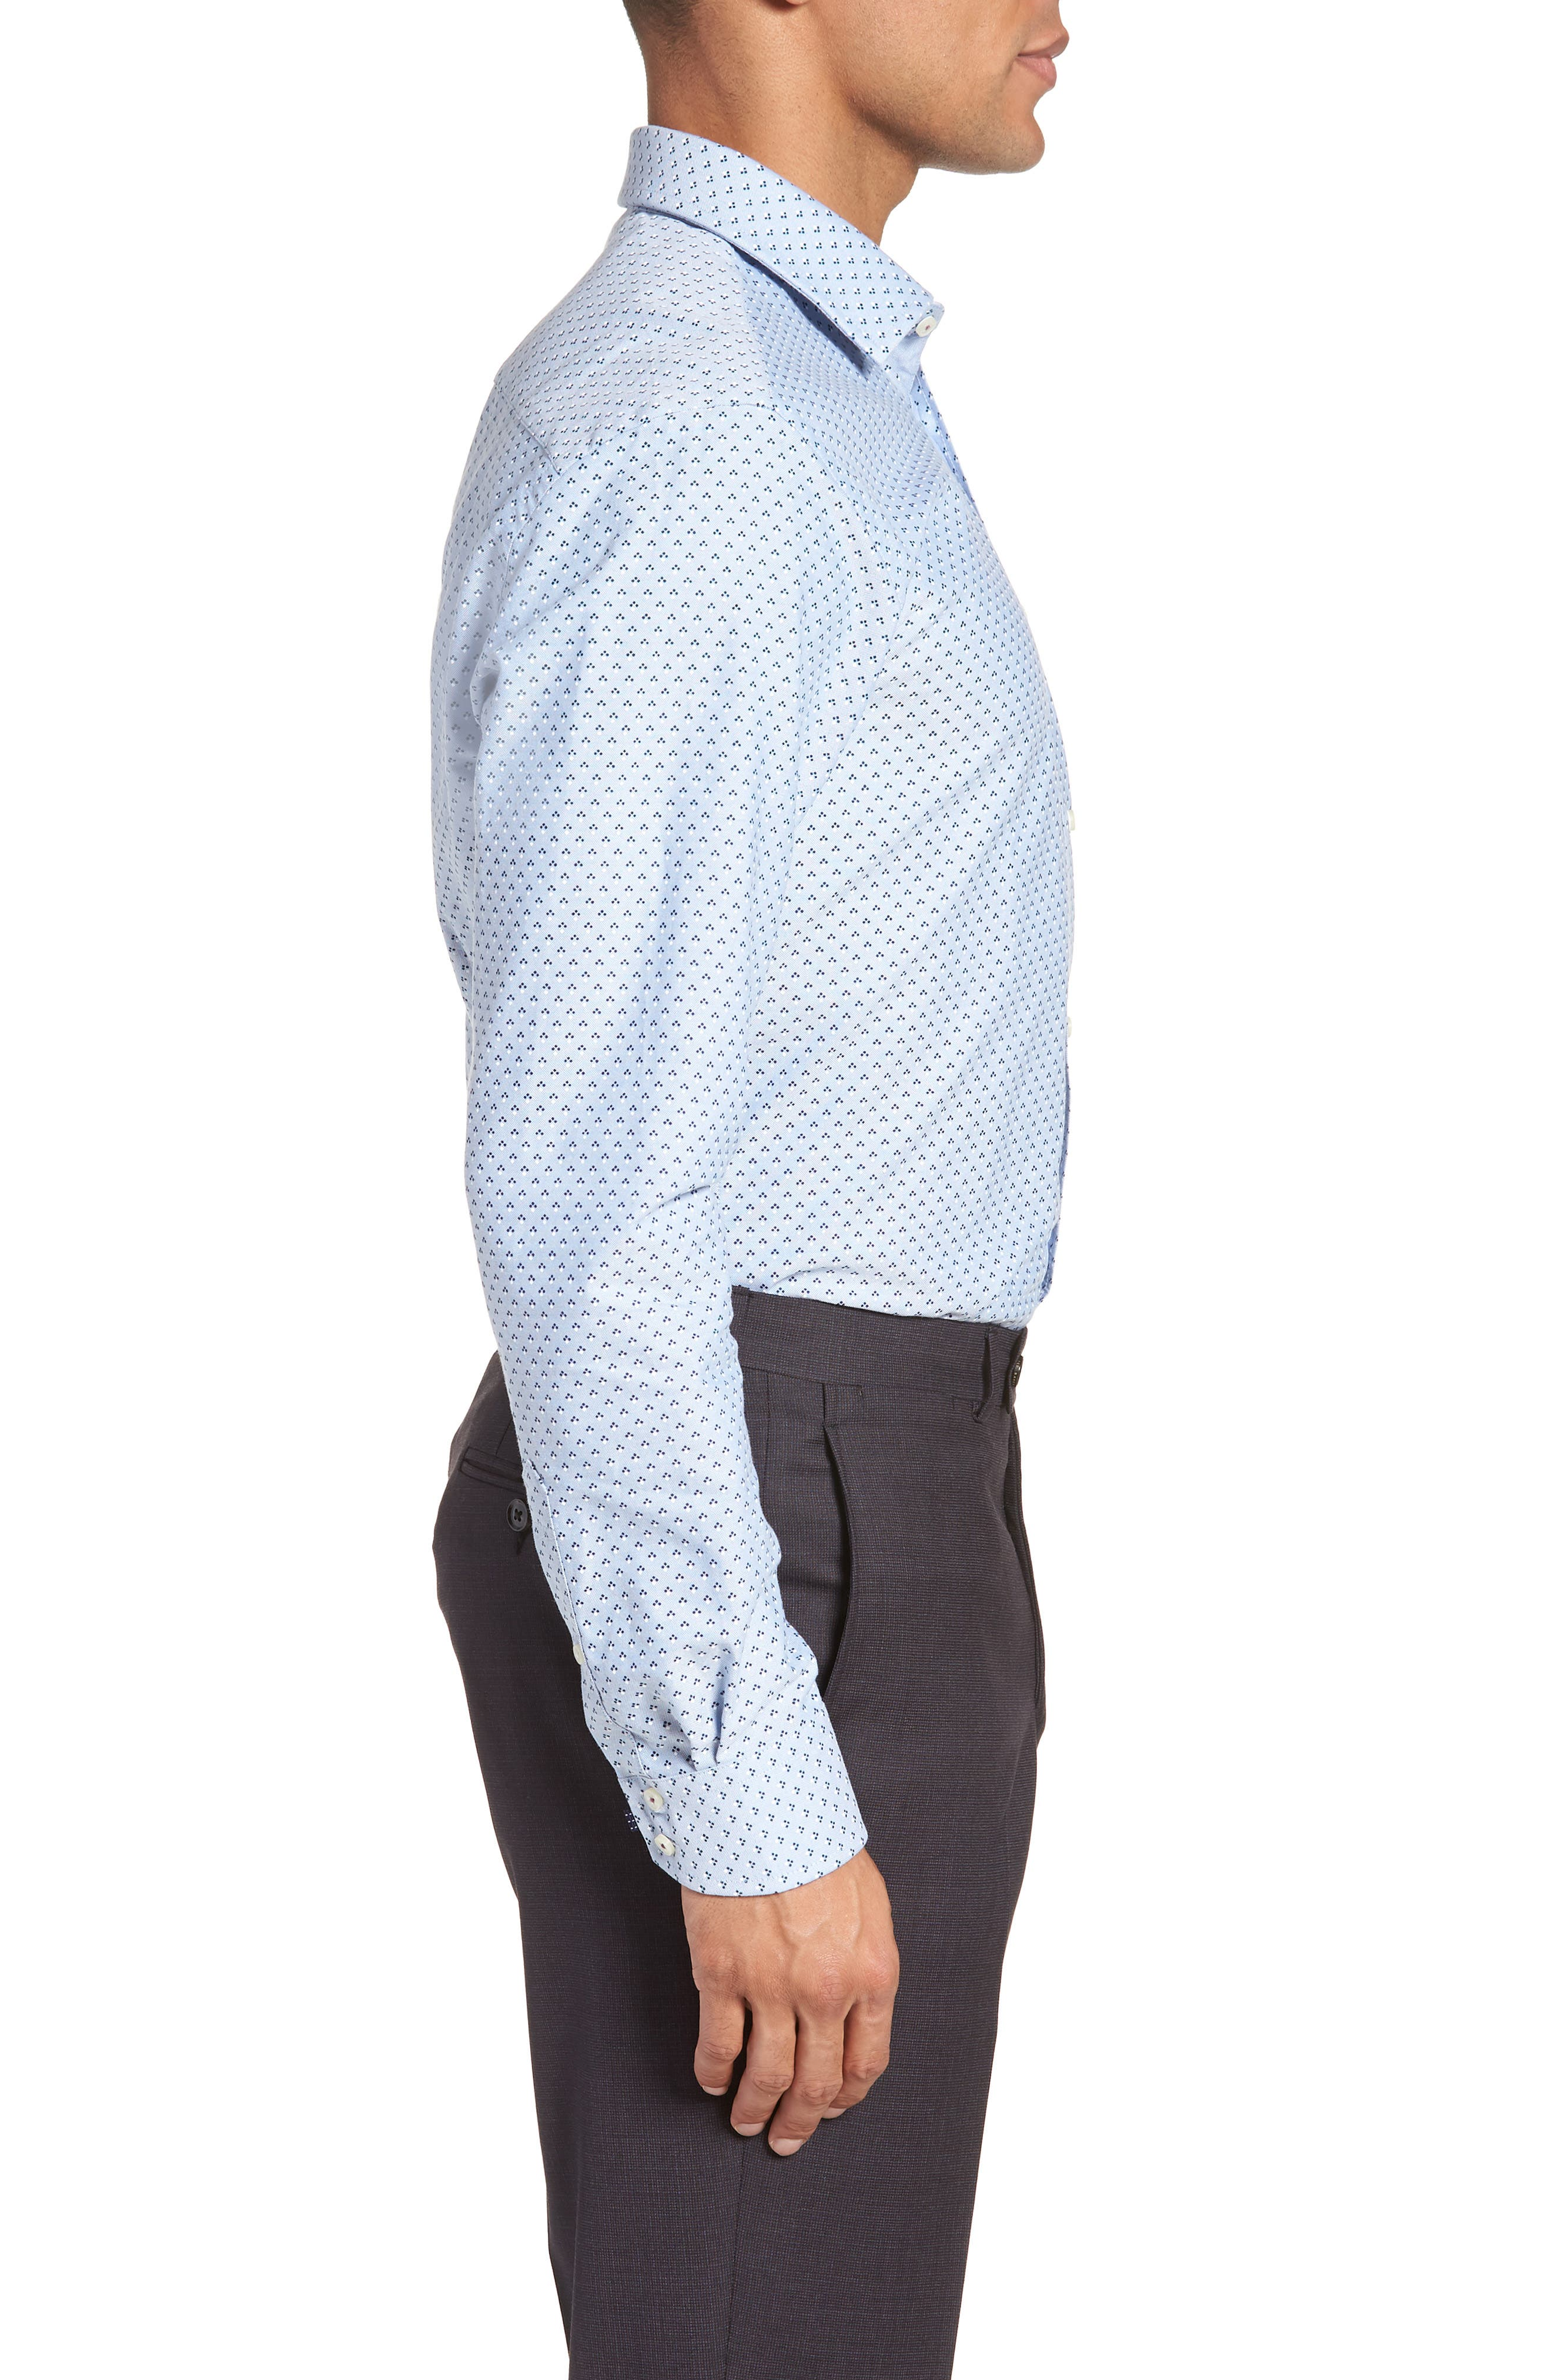 Forestr Trim Fit Geometric Dress Shirt,                             Alternate thumbnail 4, color,                             Blue